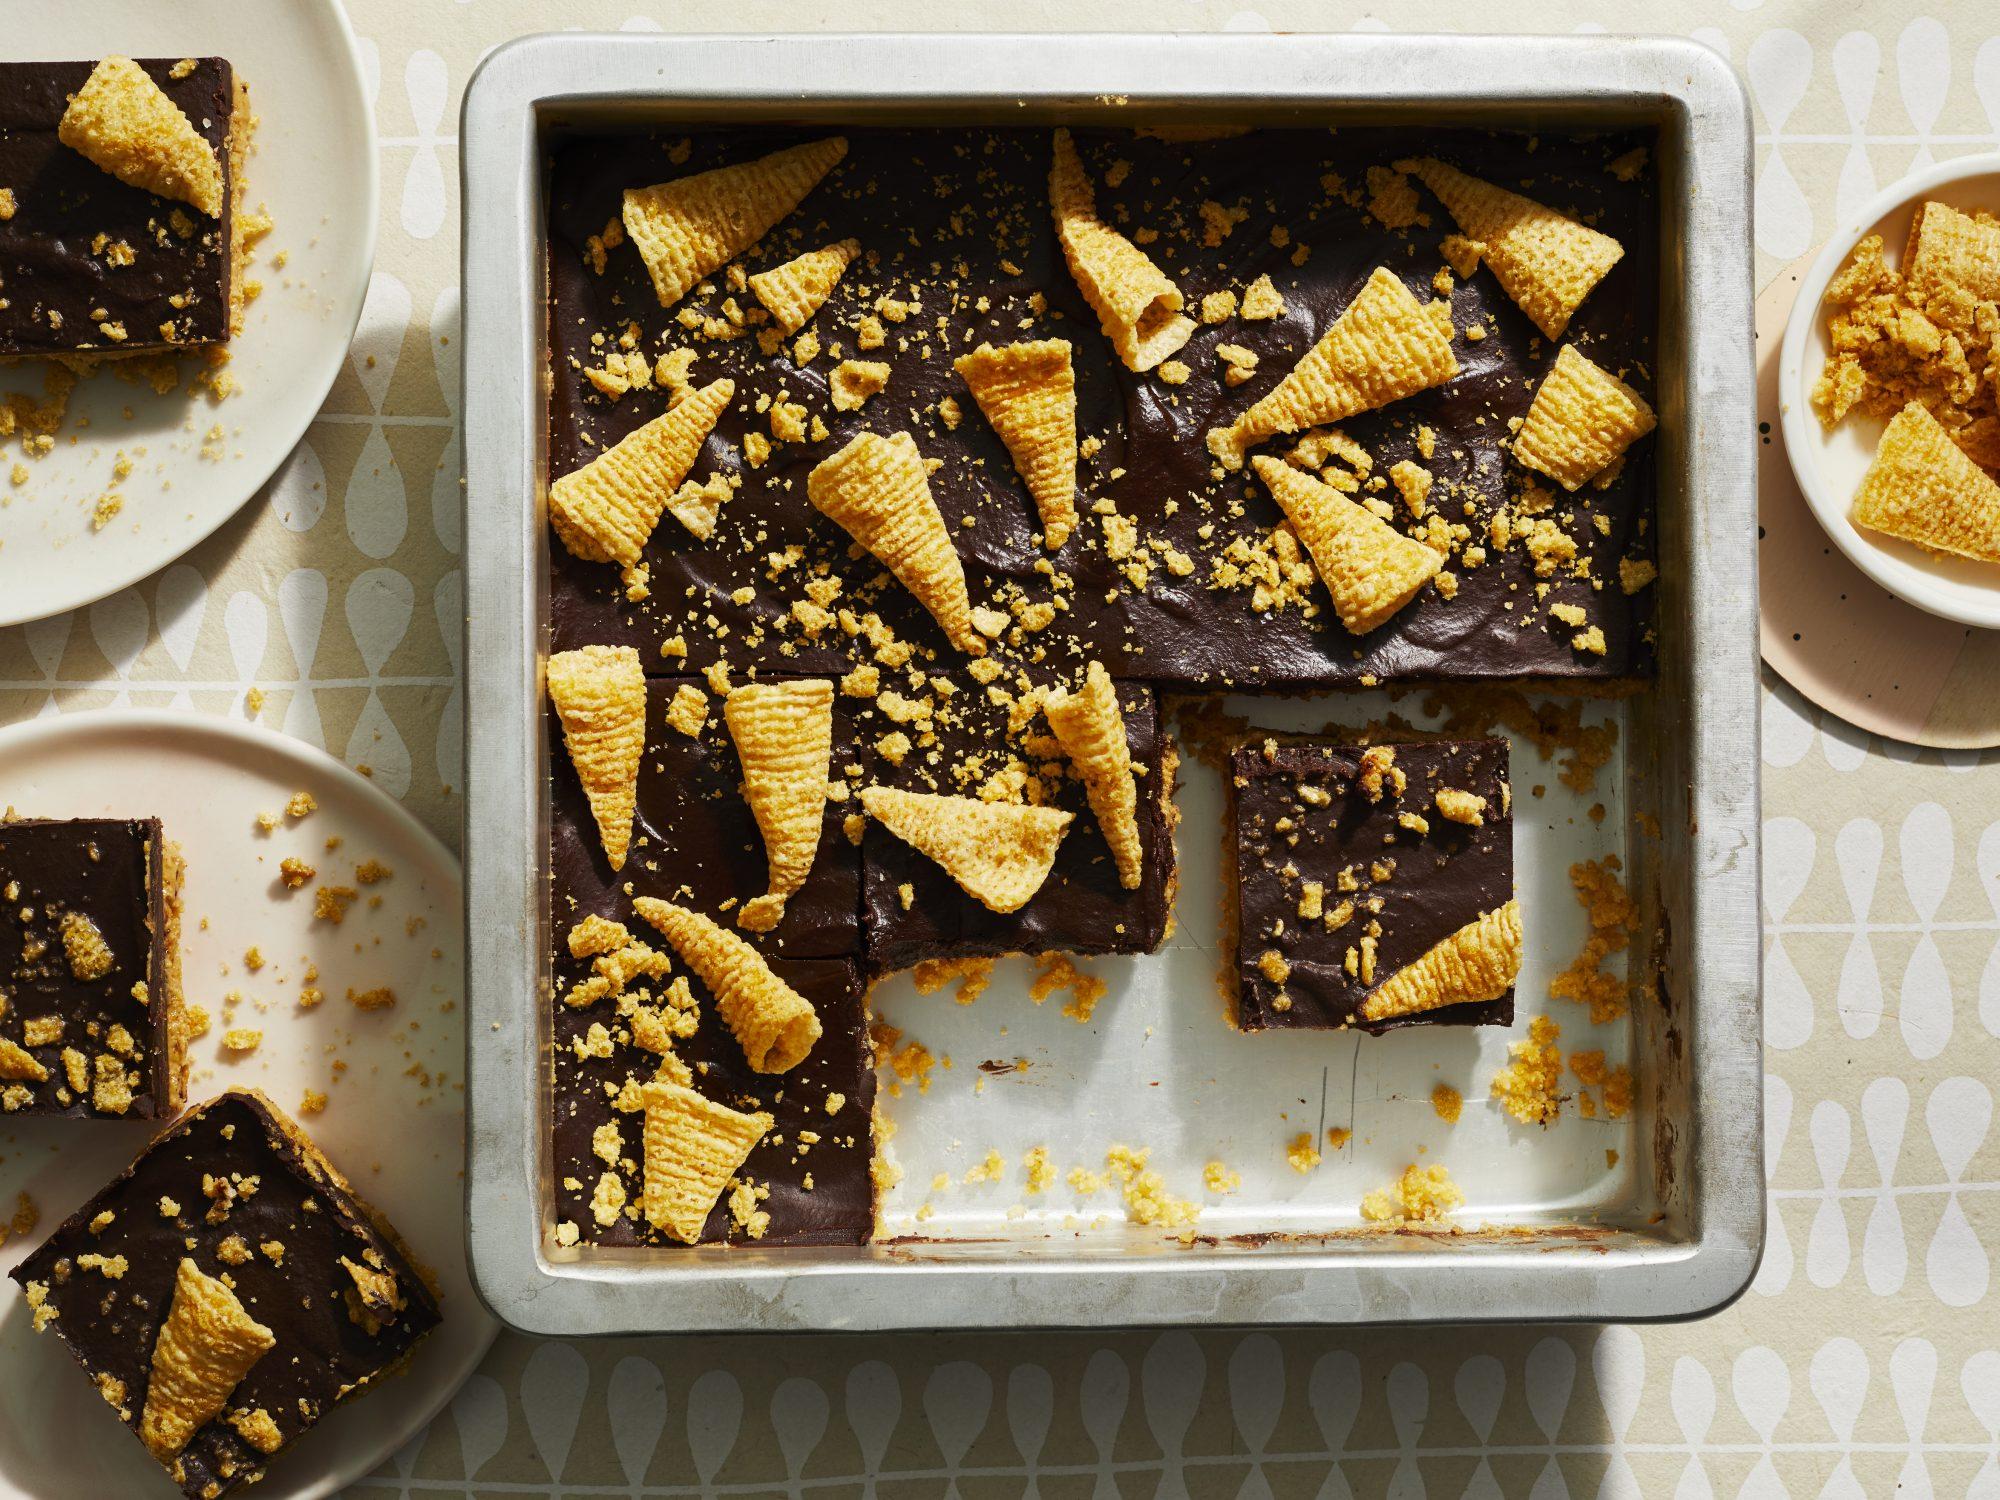 Chocolate-Peanut Butter Bugle Bars image